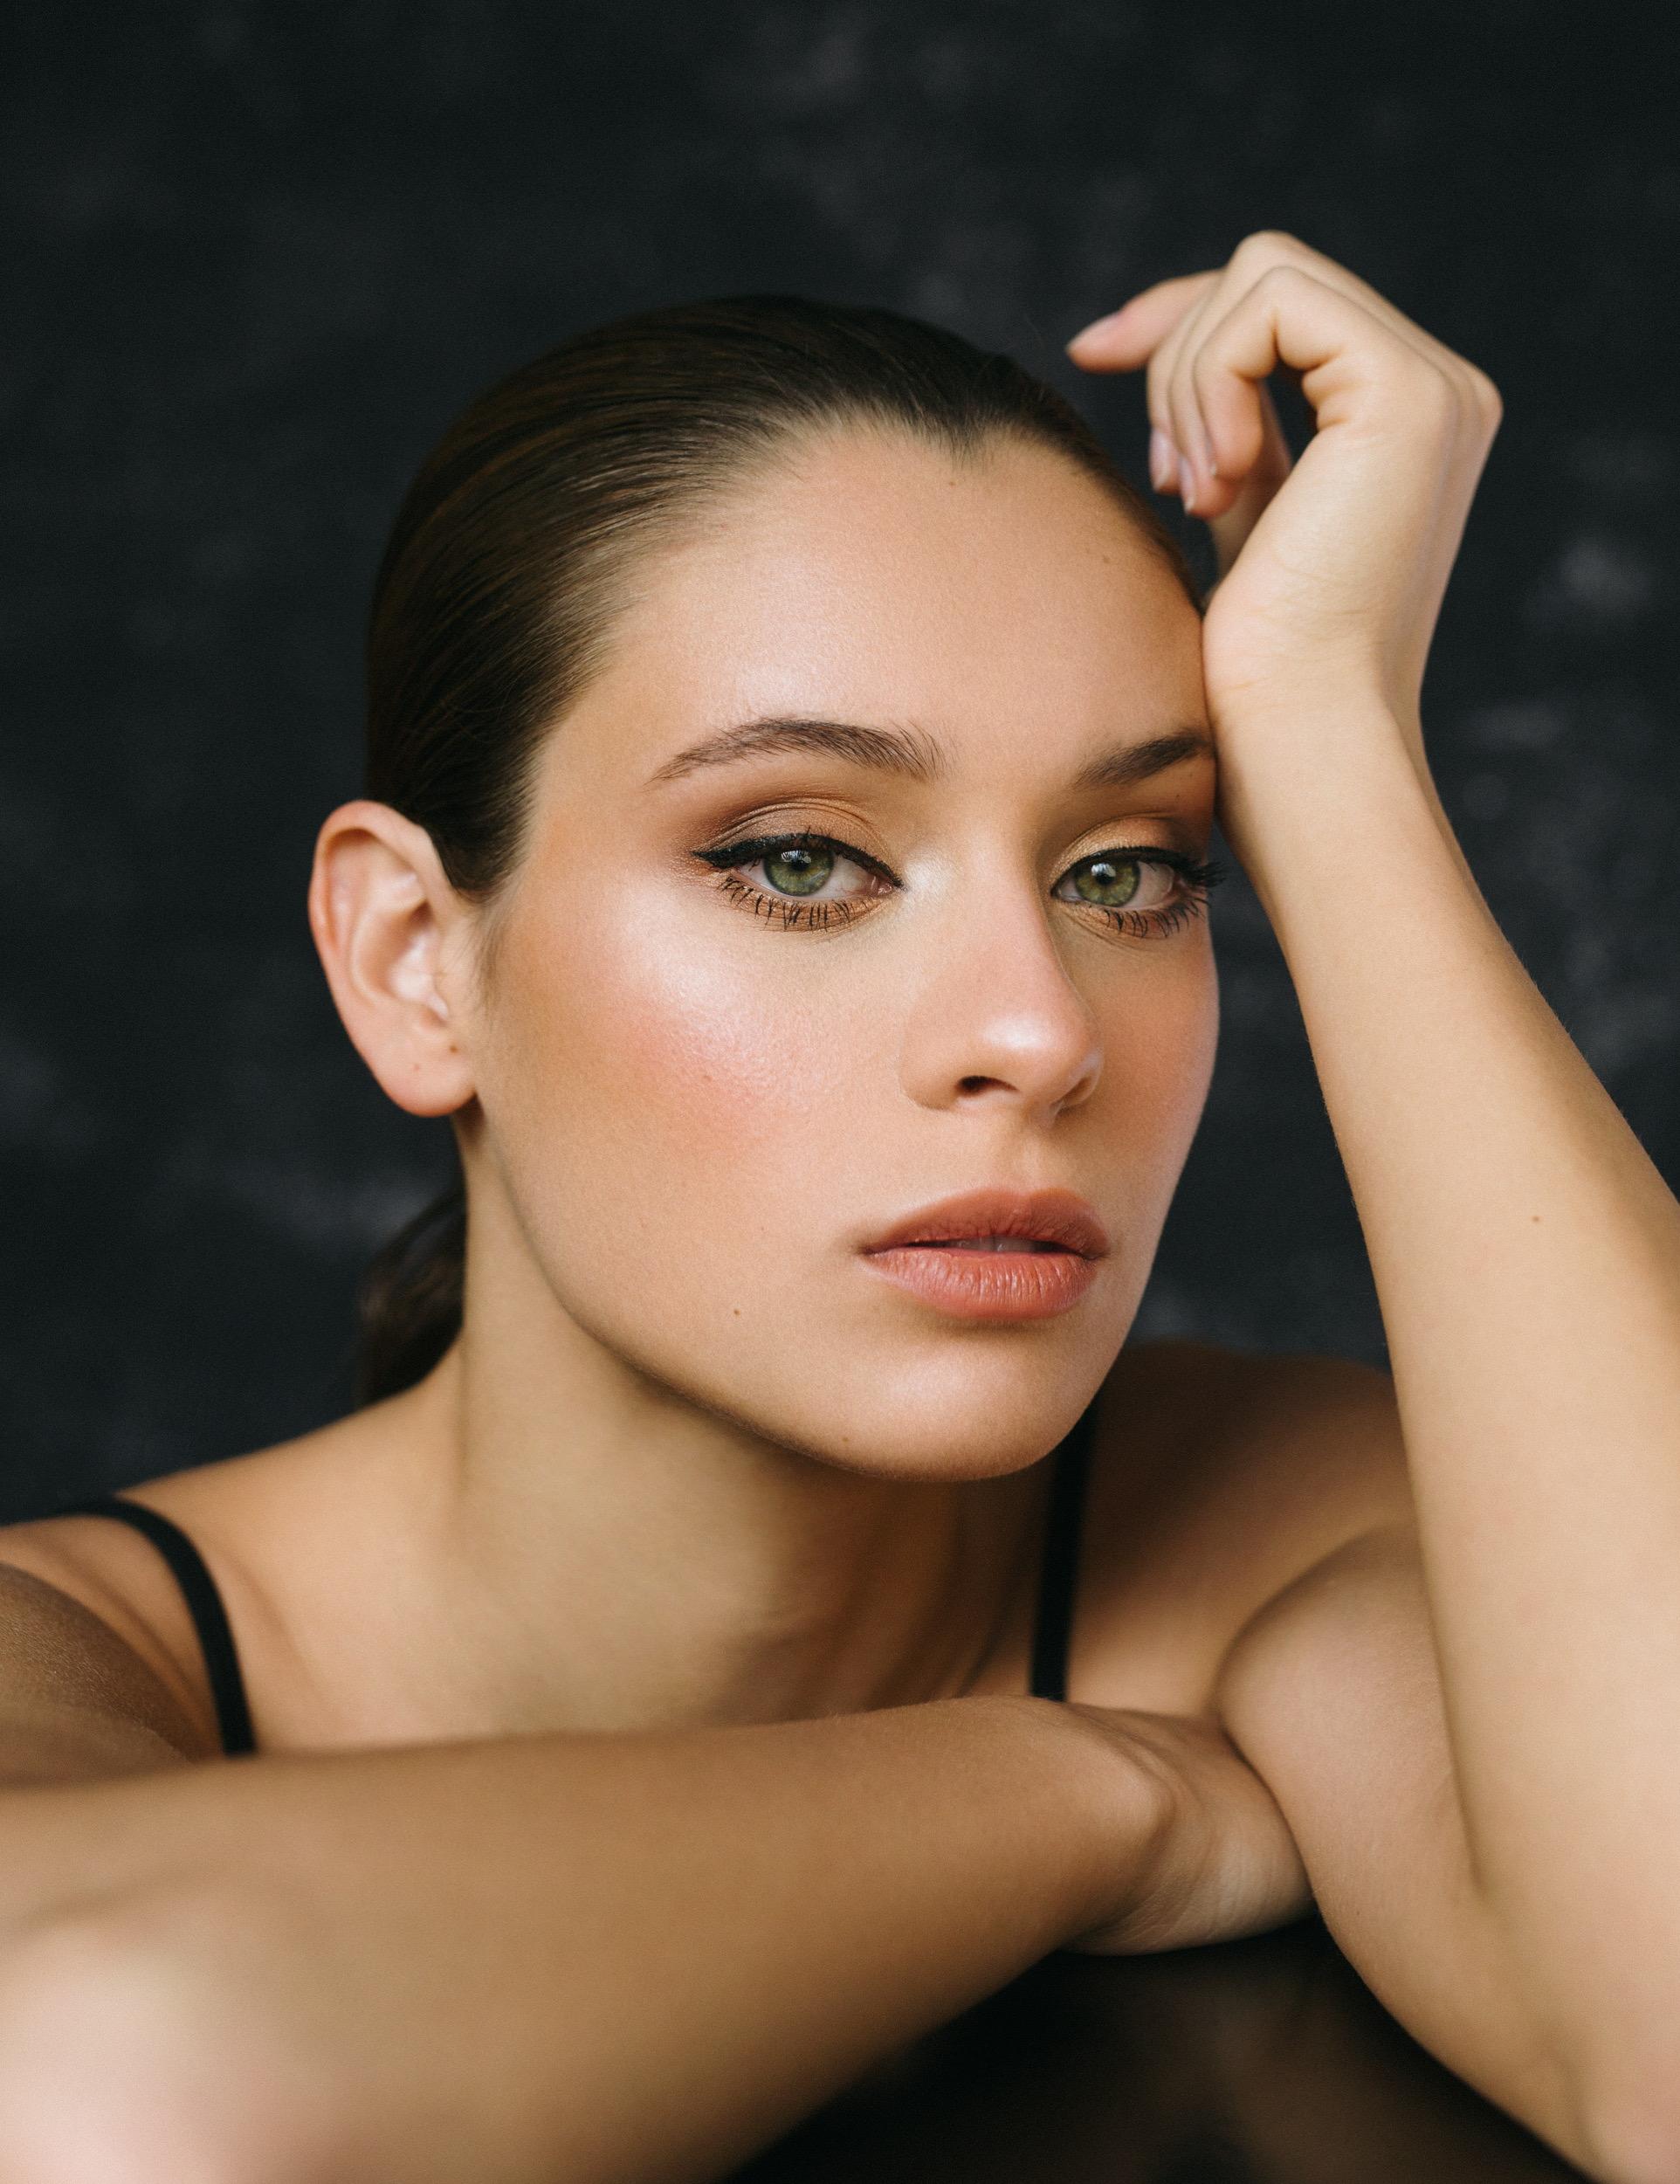 Daniela Melchior - IMDb